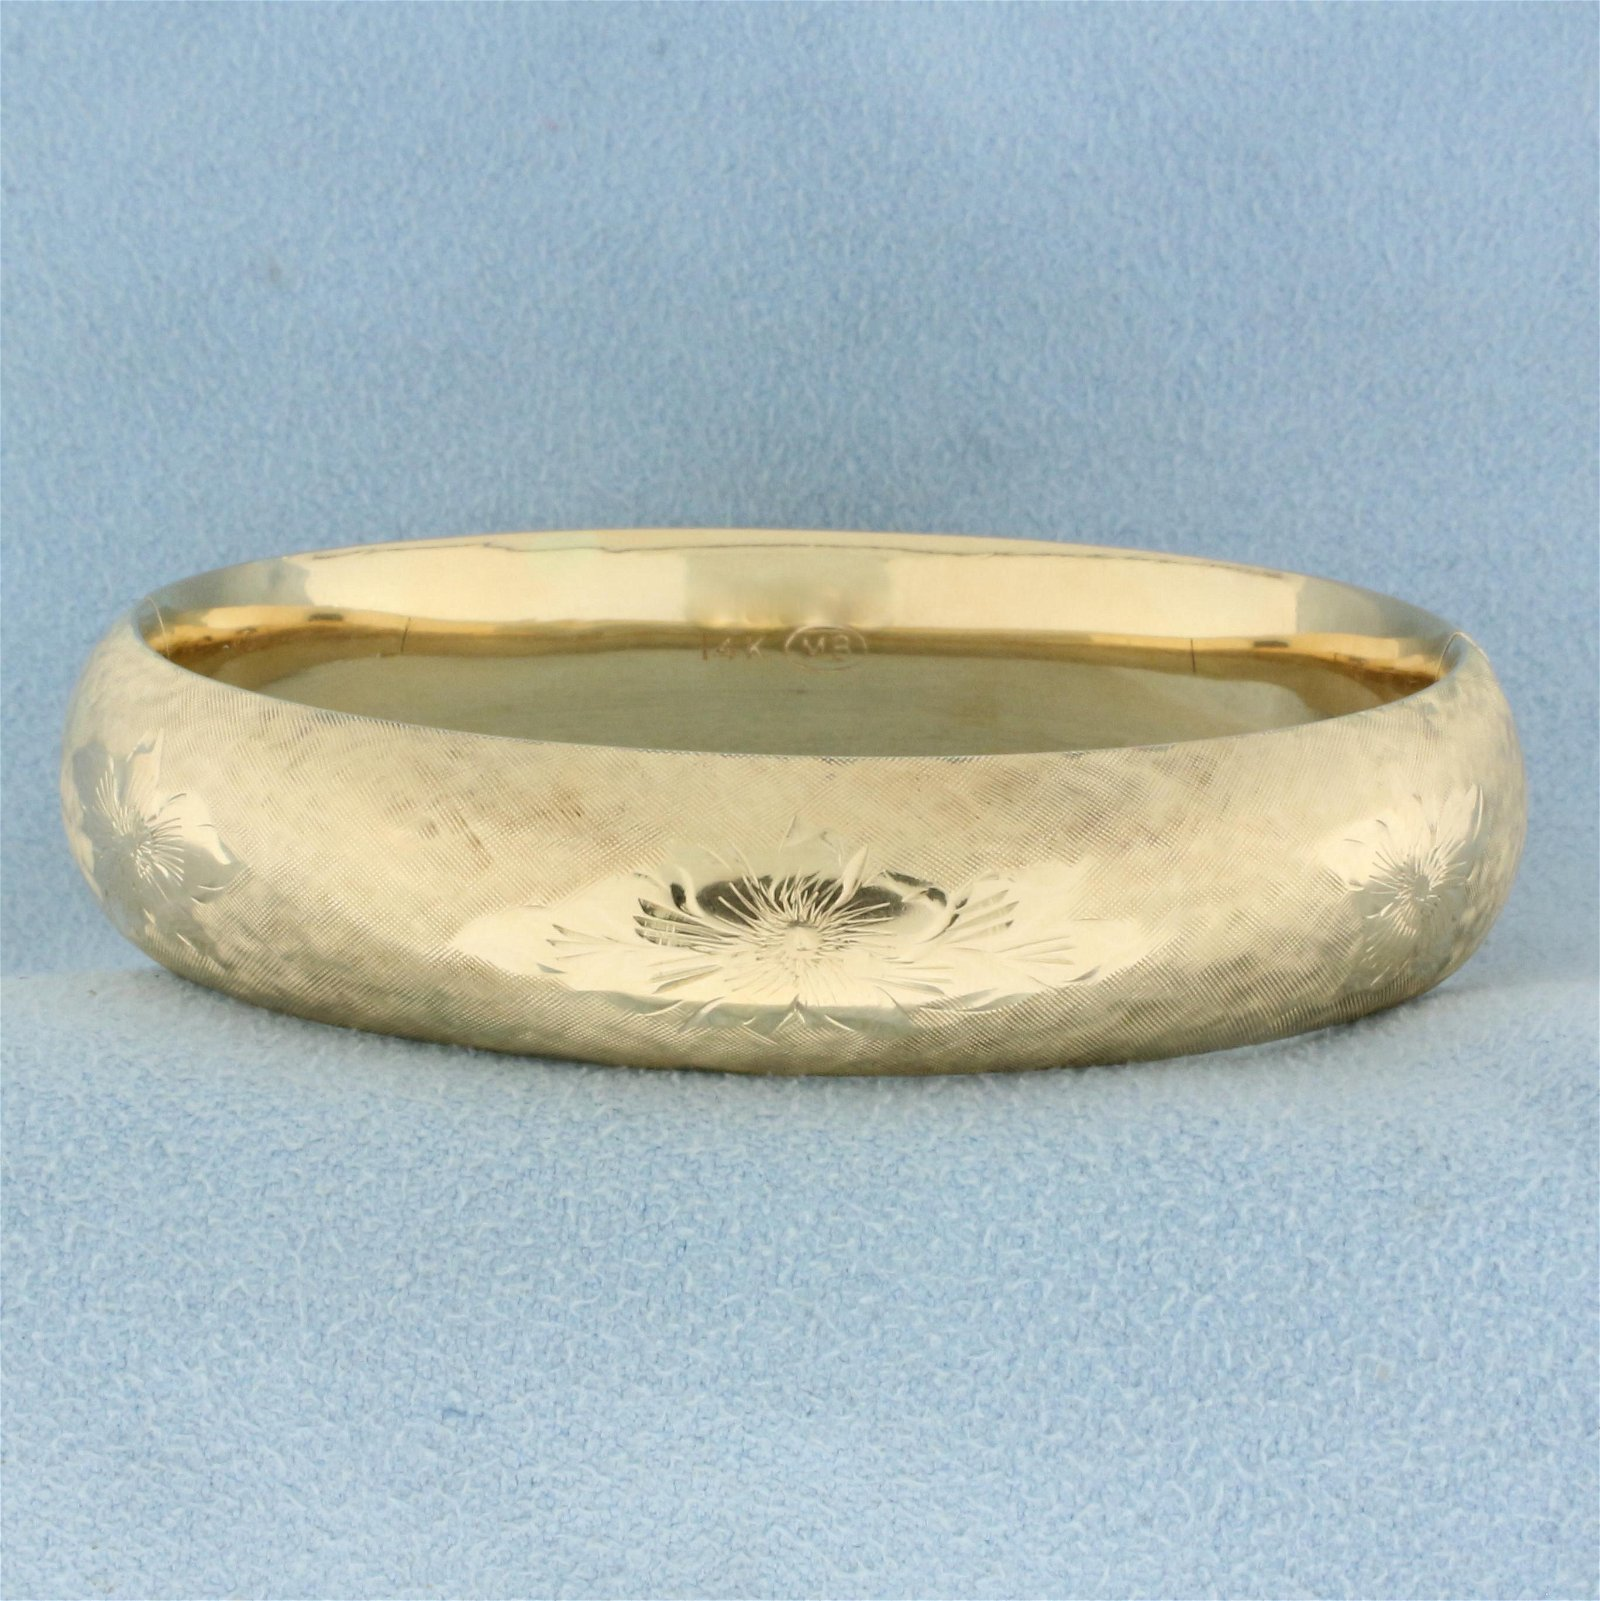 Engraved Bangle Bracelet in 14K Yellow Gold